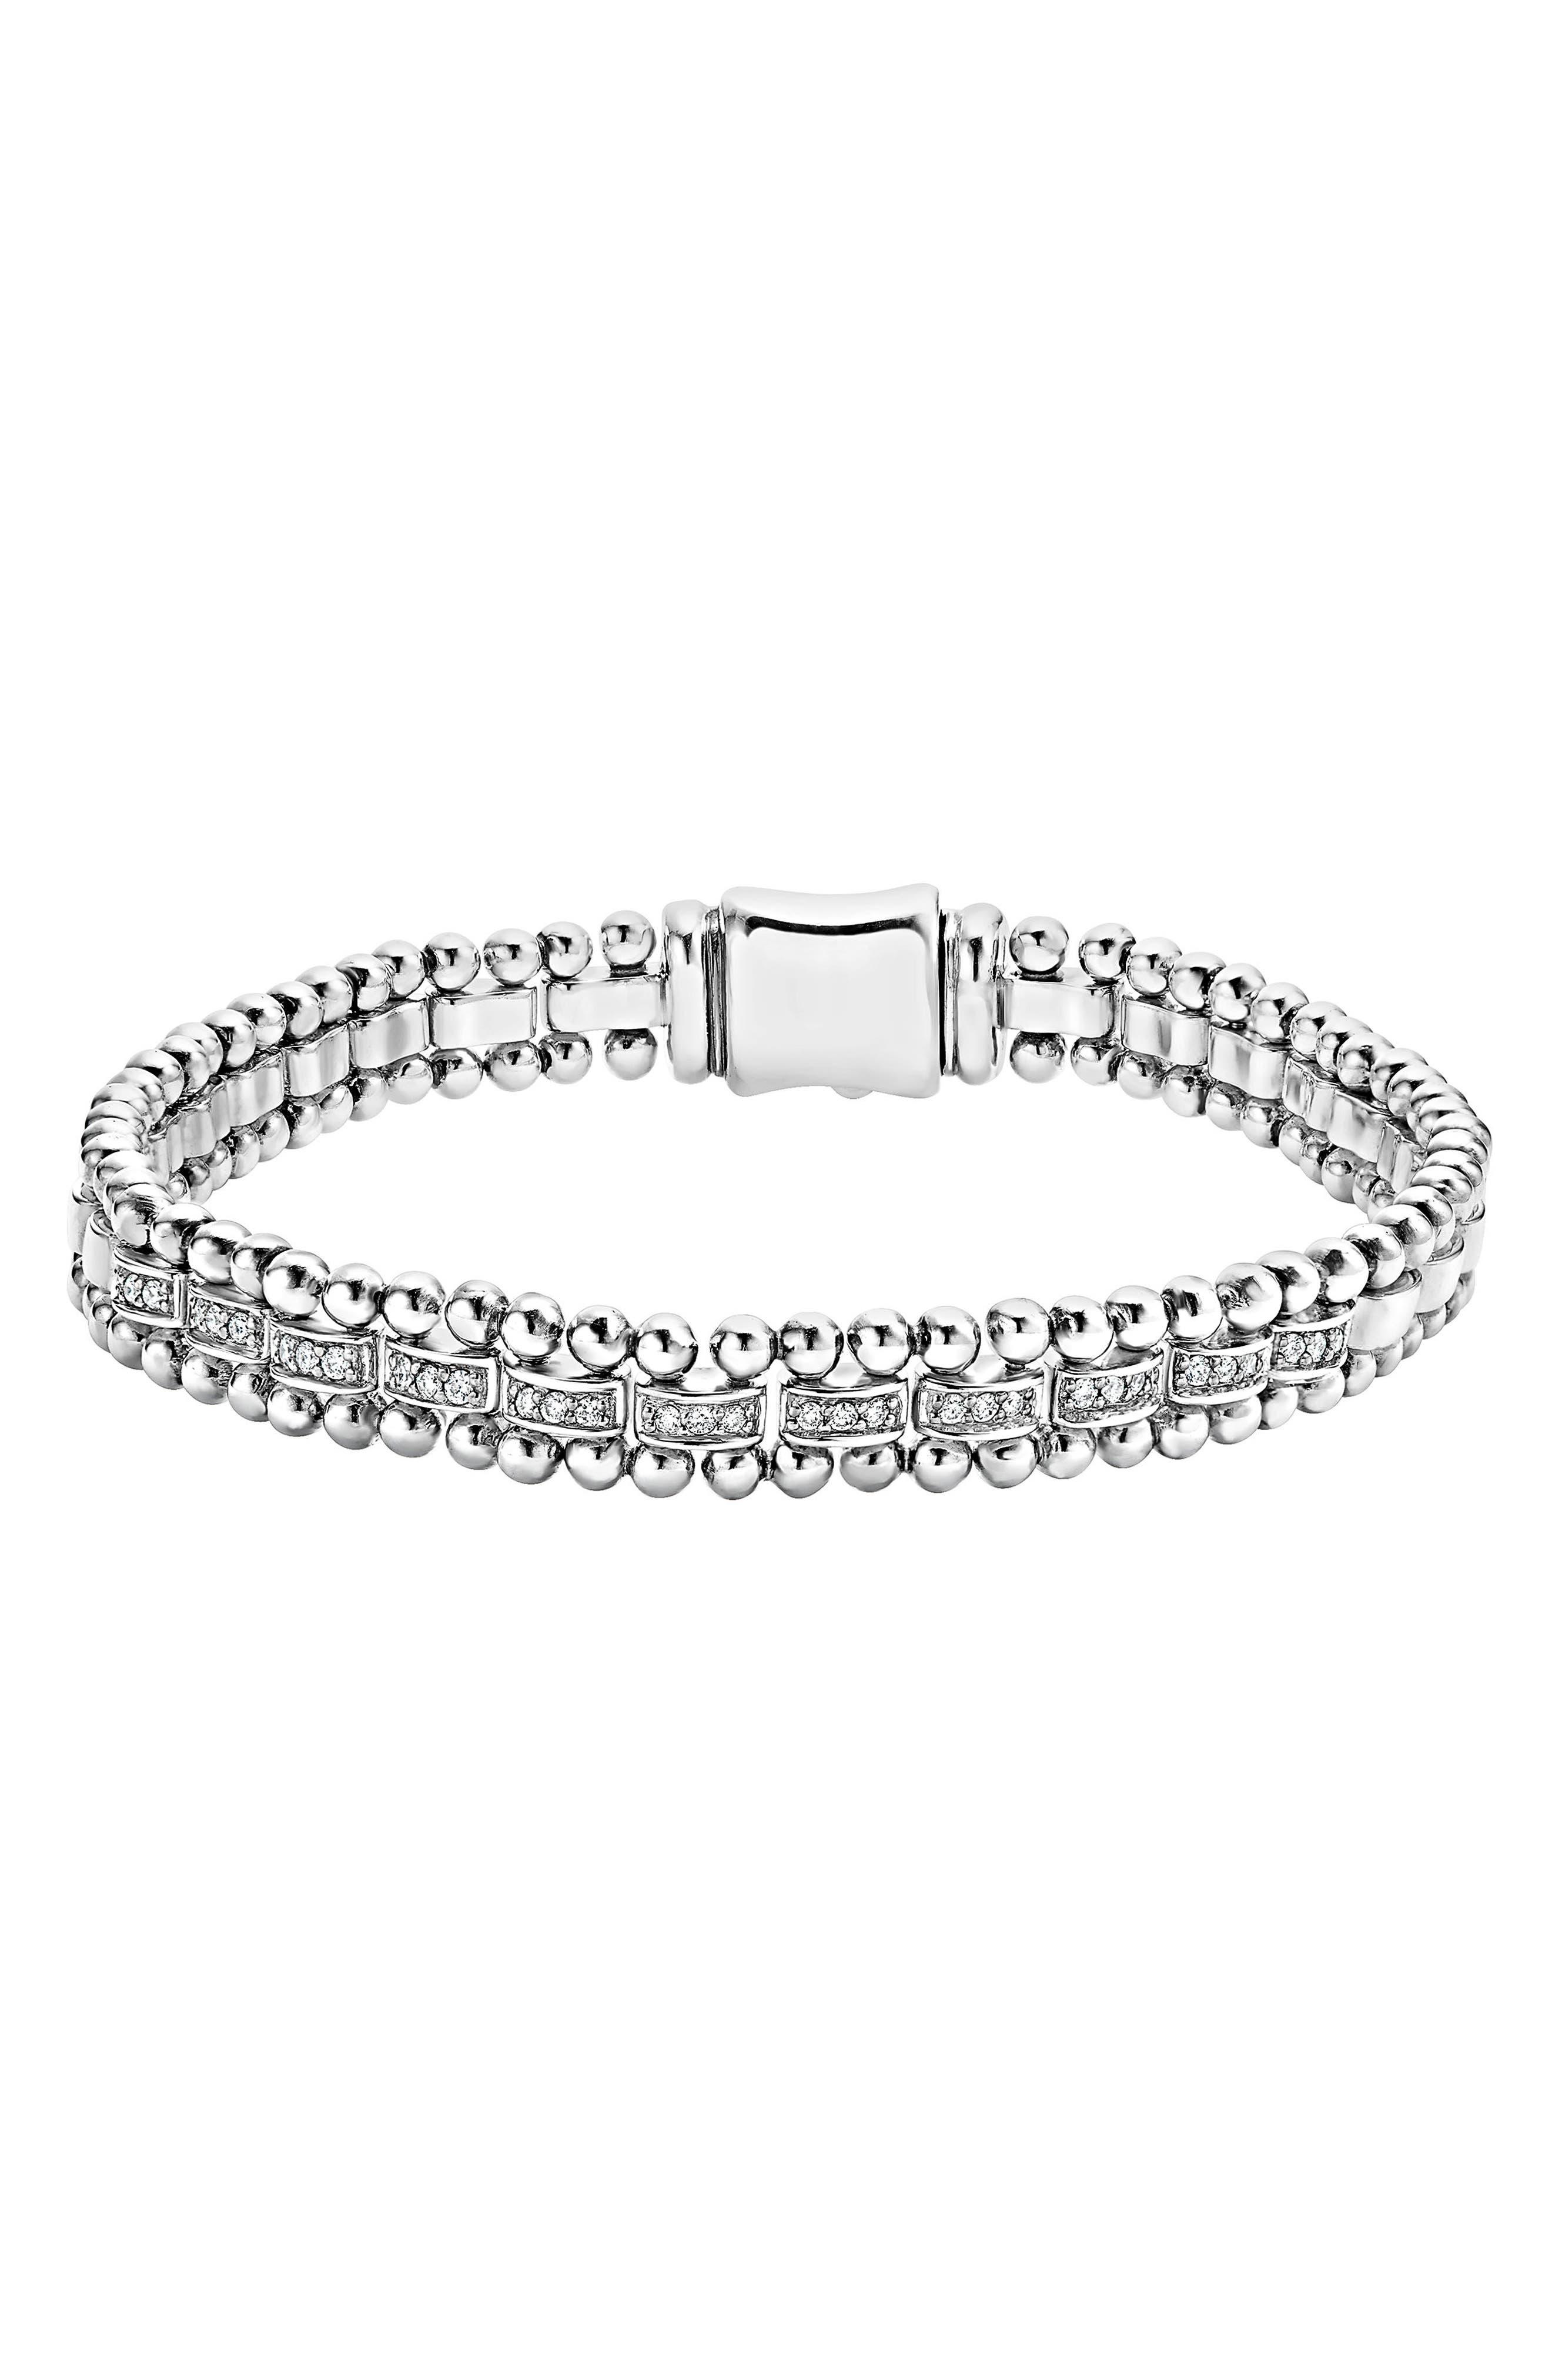 Caviar Spark Diamond Link Bracelet,                             Main thumbnail 1, color,                             SILVER/ DIAMOND